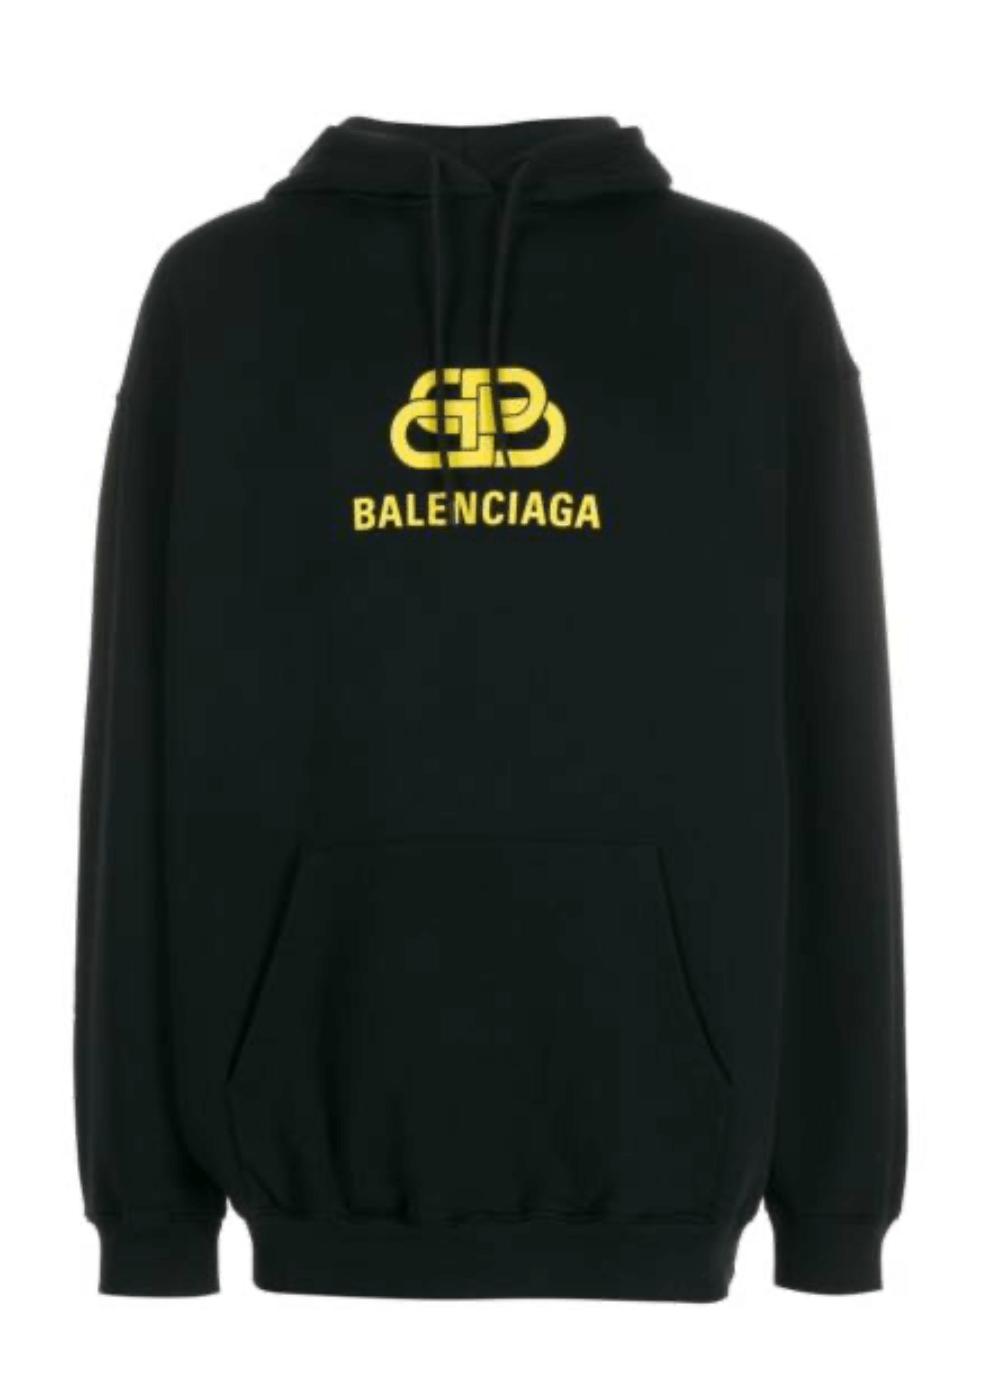 Balenciaga-Hoodie-Herren-BB-Schwarz-Gelb